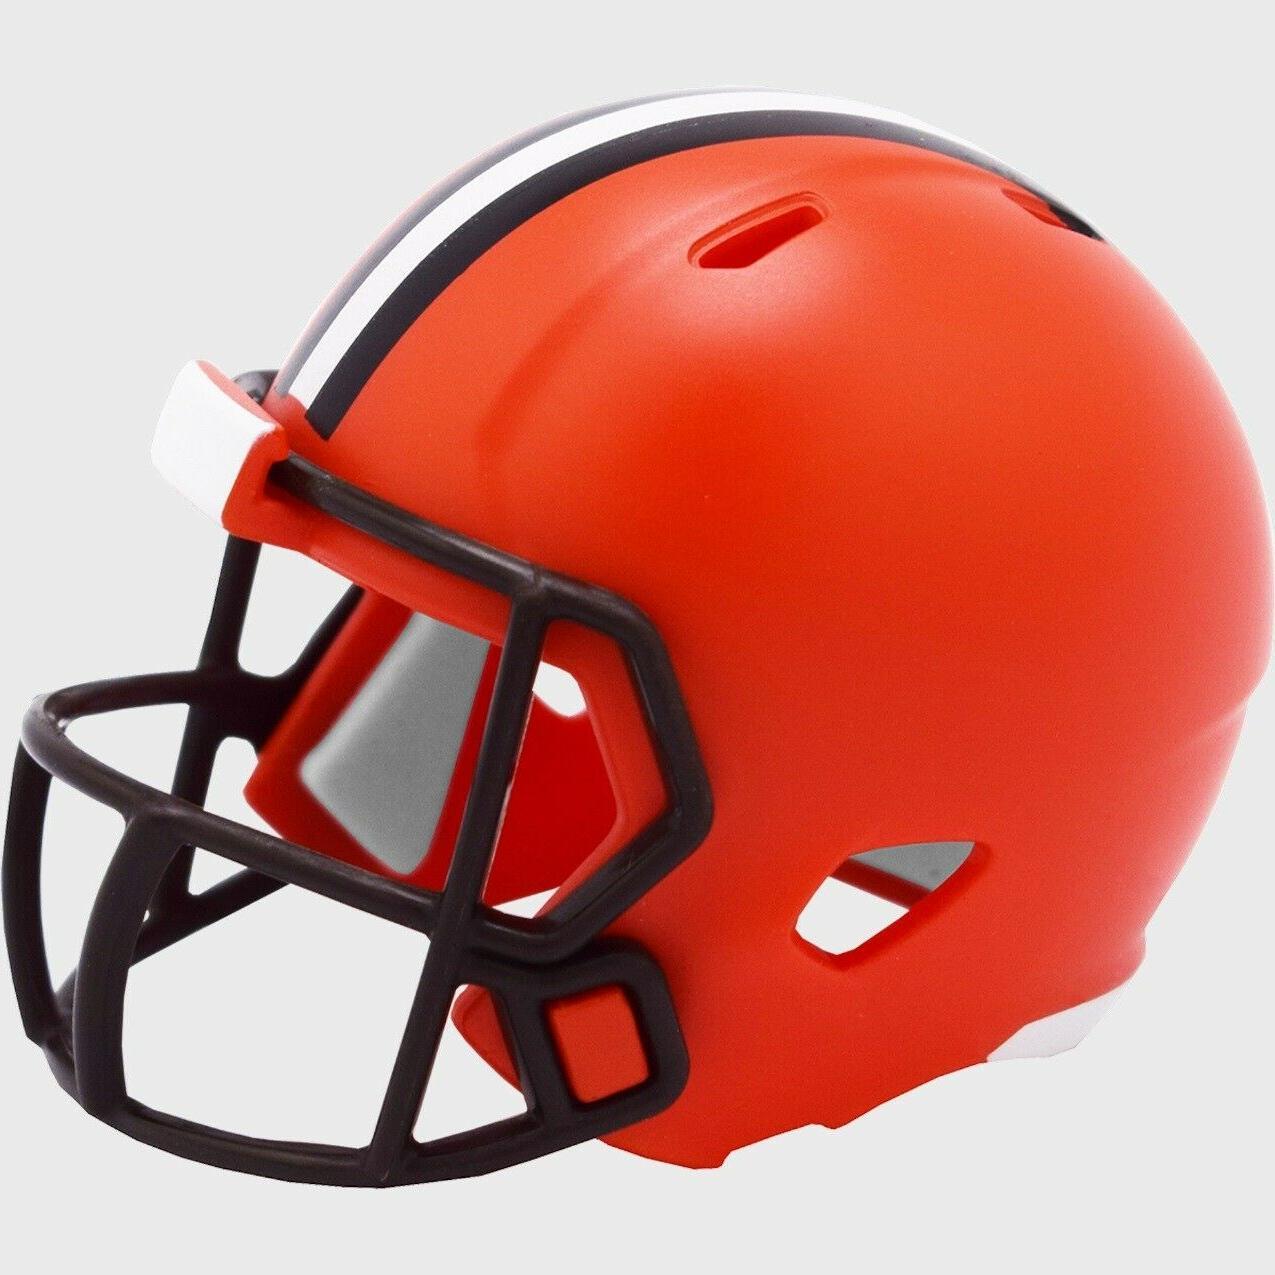 CLEVELAND - Helmet